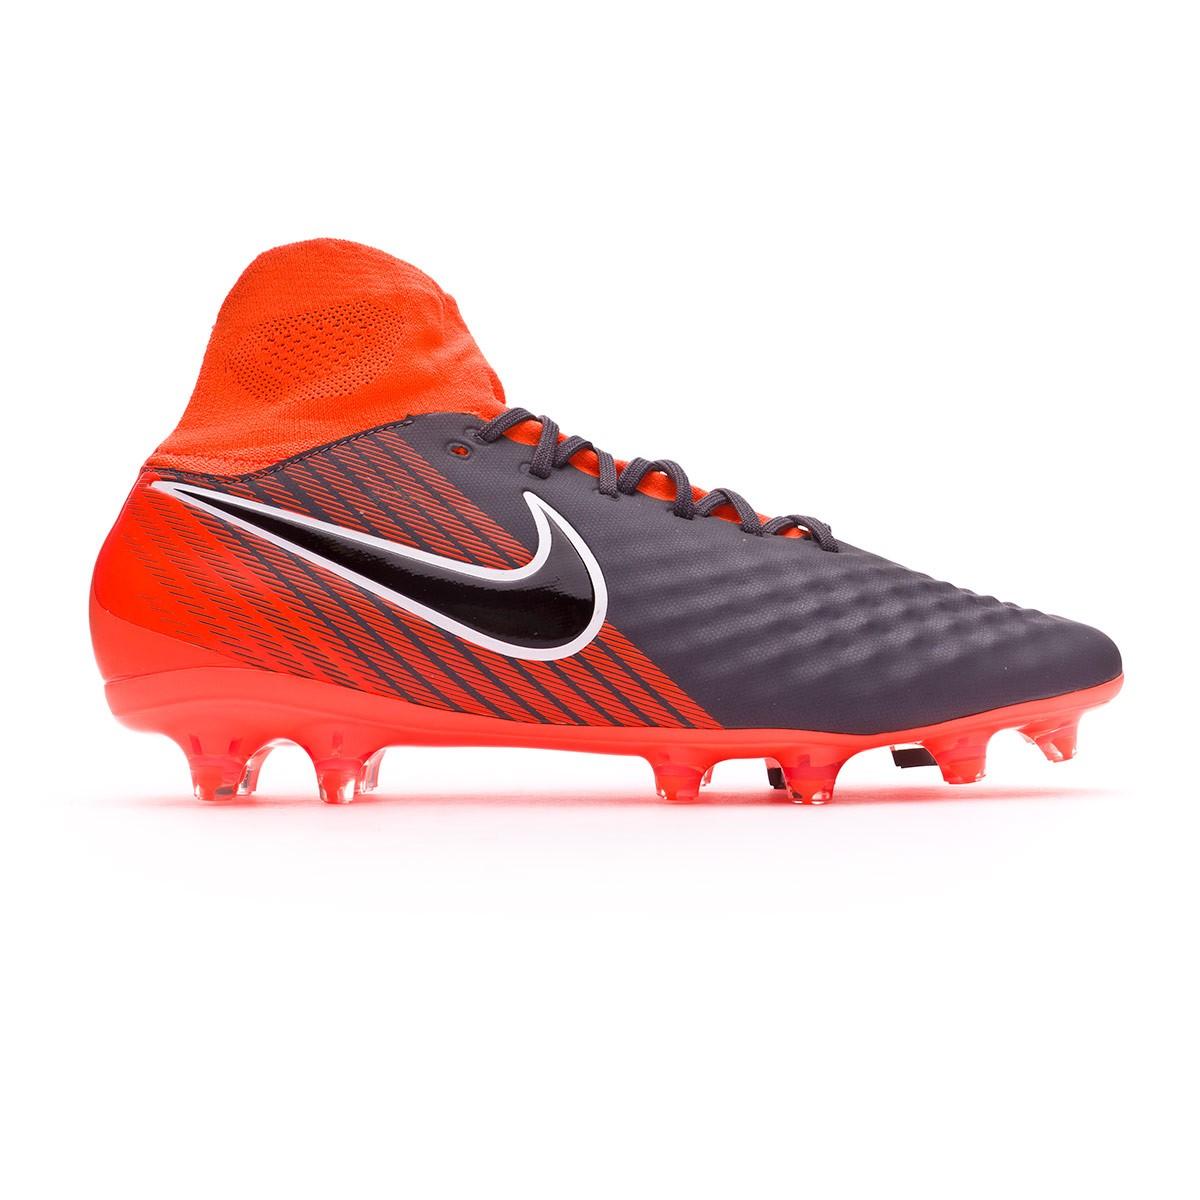 2fdb483a1039f Football Boots Nike Magista Obra II Pro DF FG Dark grey-Black-Total orange- White - Tienda de fútbol Fútbol Emotion